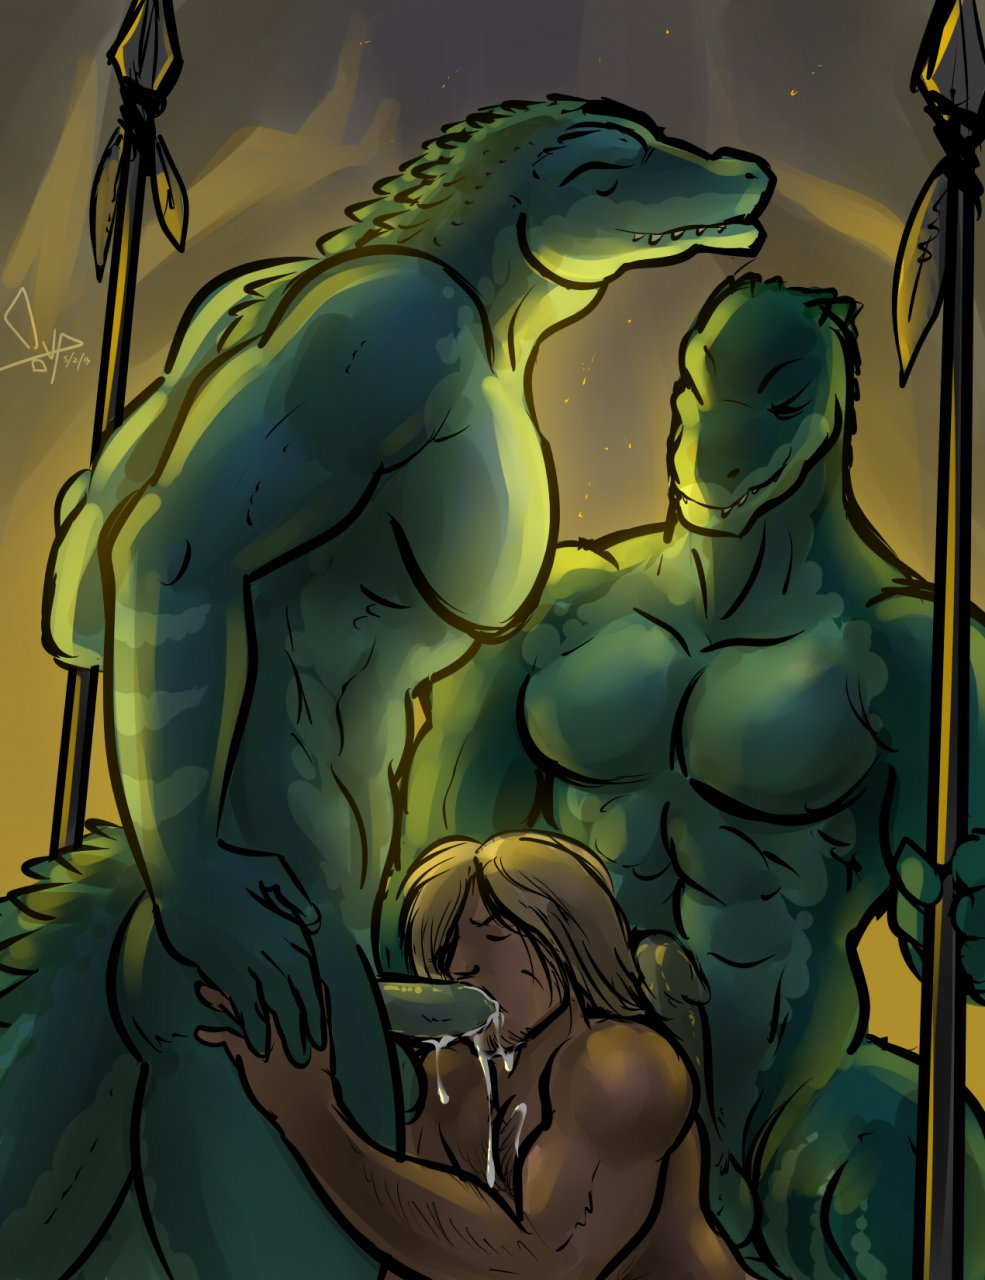 krokodil-porno-sayt